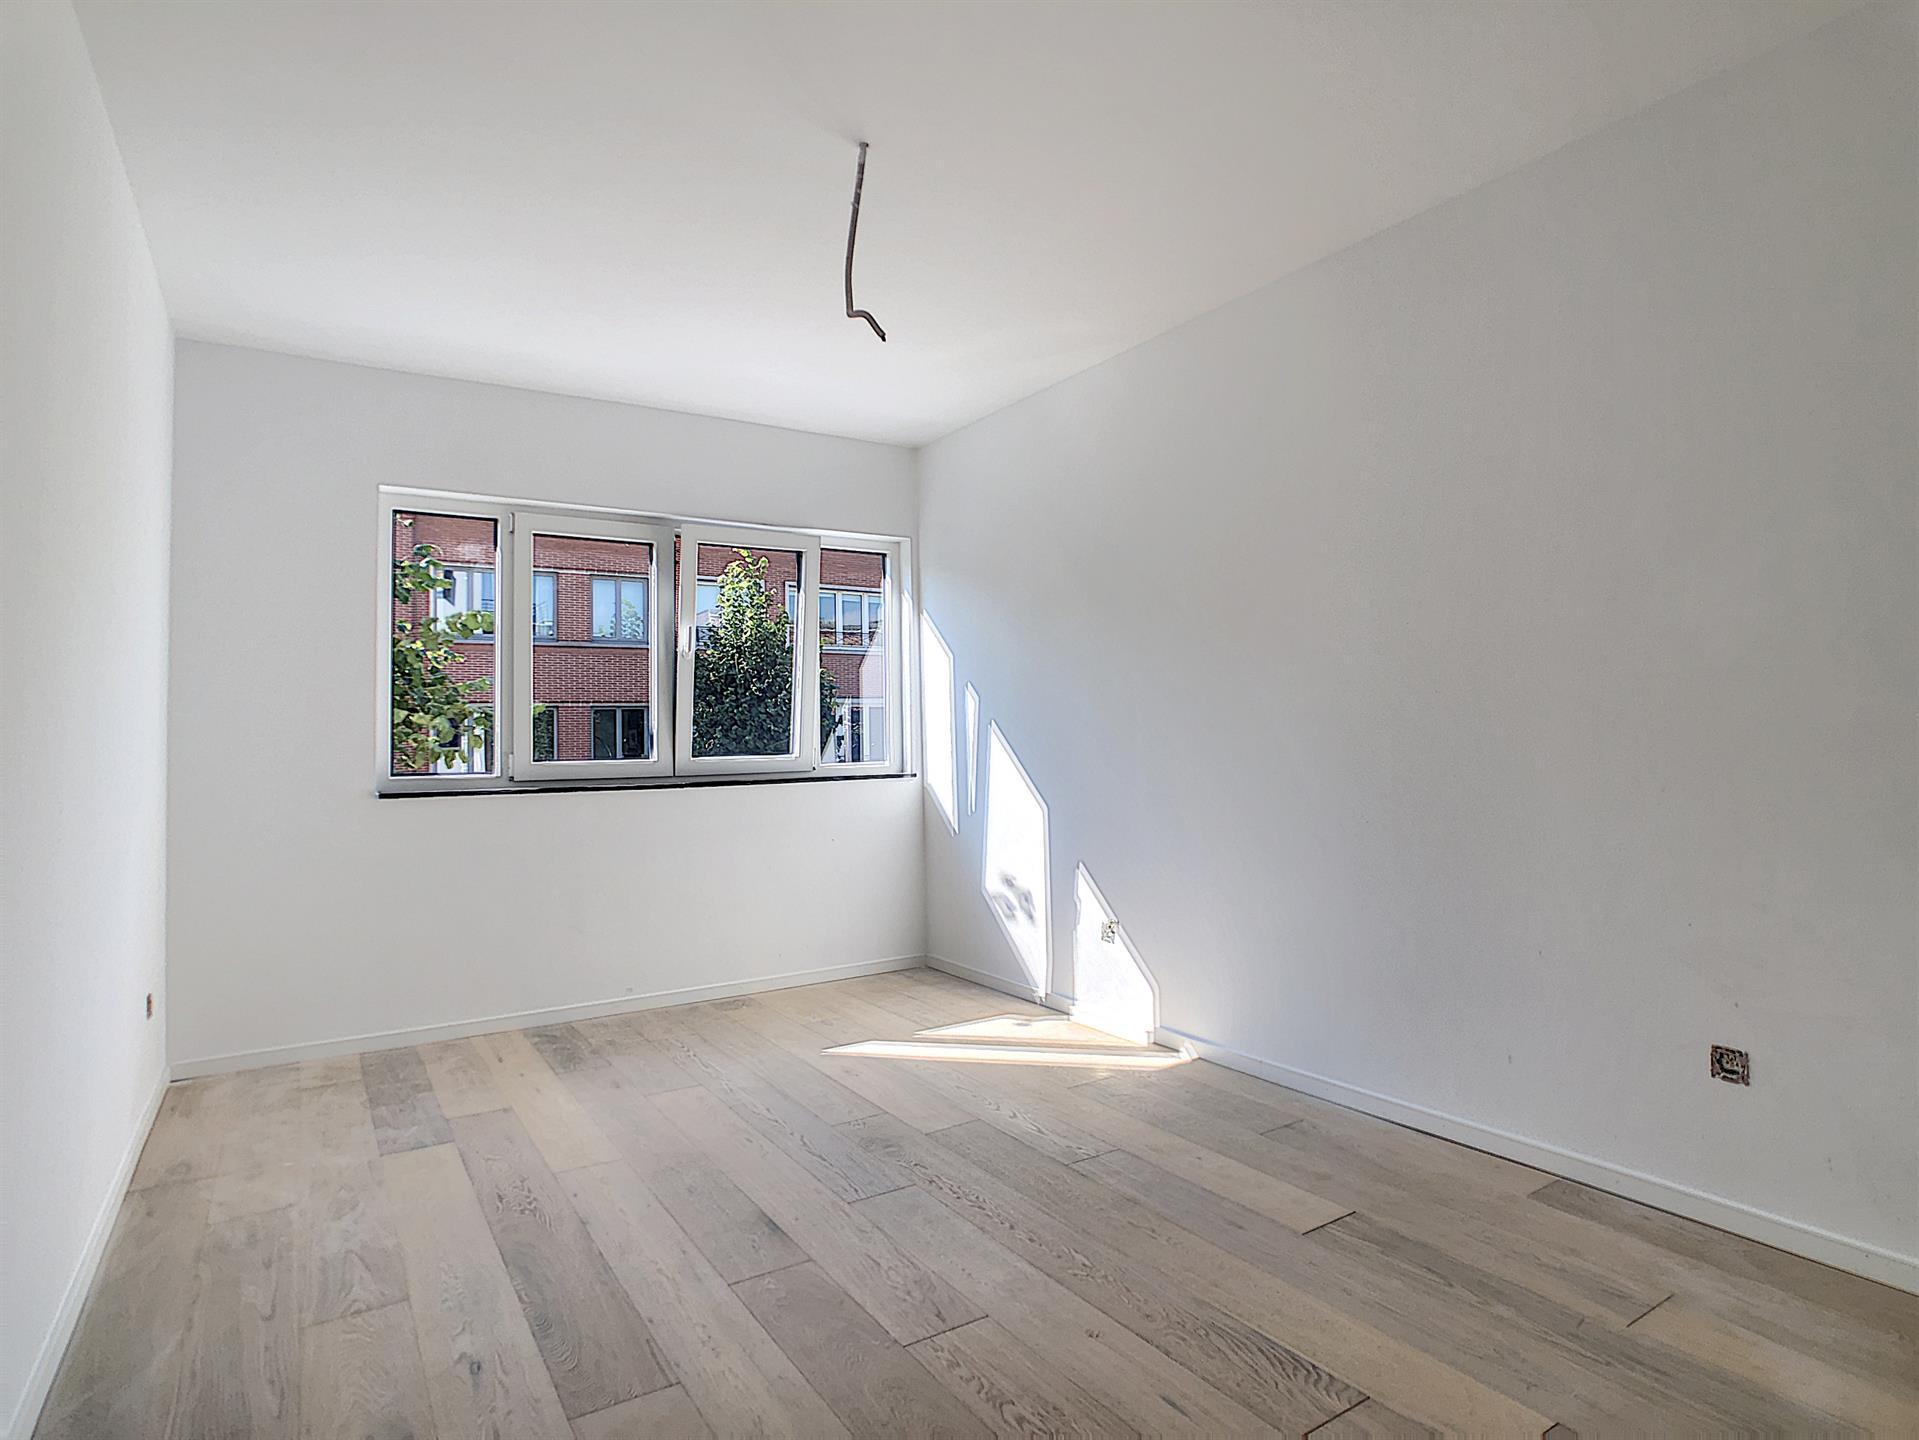 Appartement - Anderlecht - #4252388-0